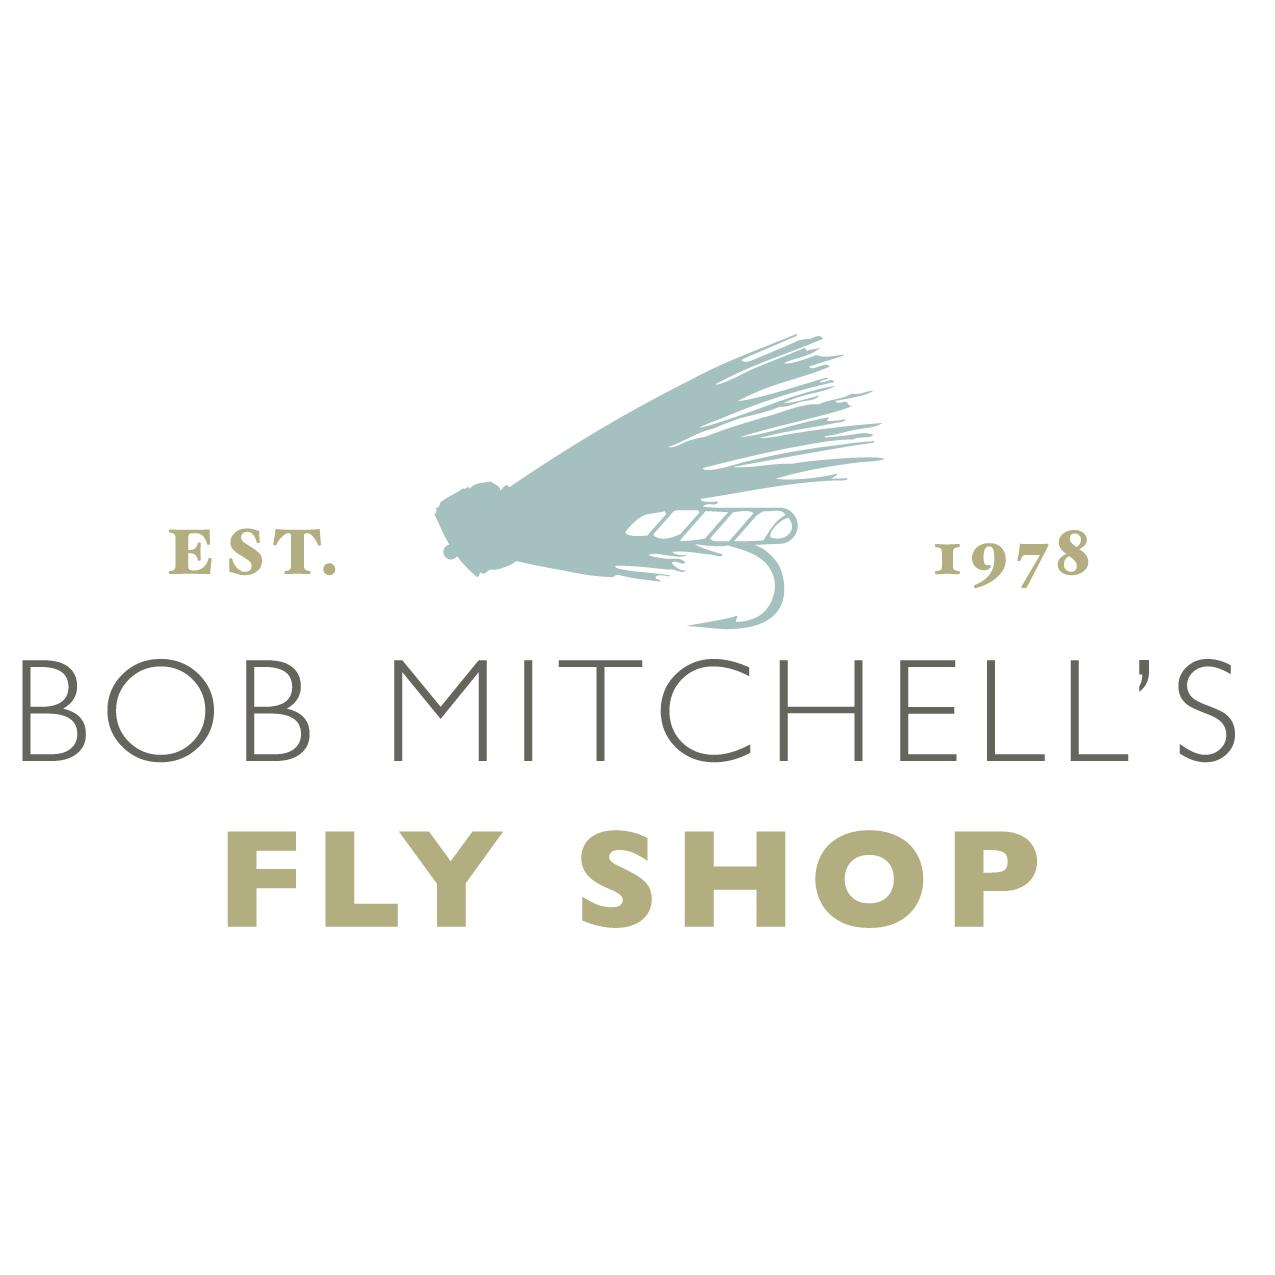 Bob Mitchell's Fly Shop - Saint Paul, MN - Fishing Tackle & Supplies